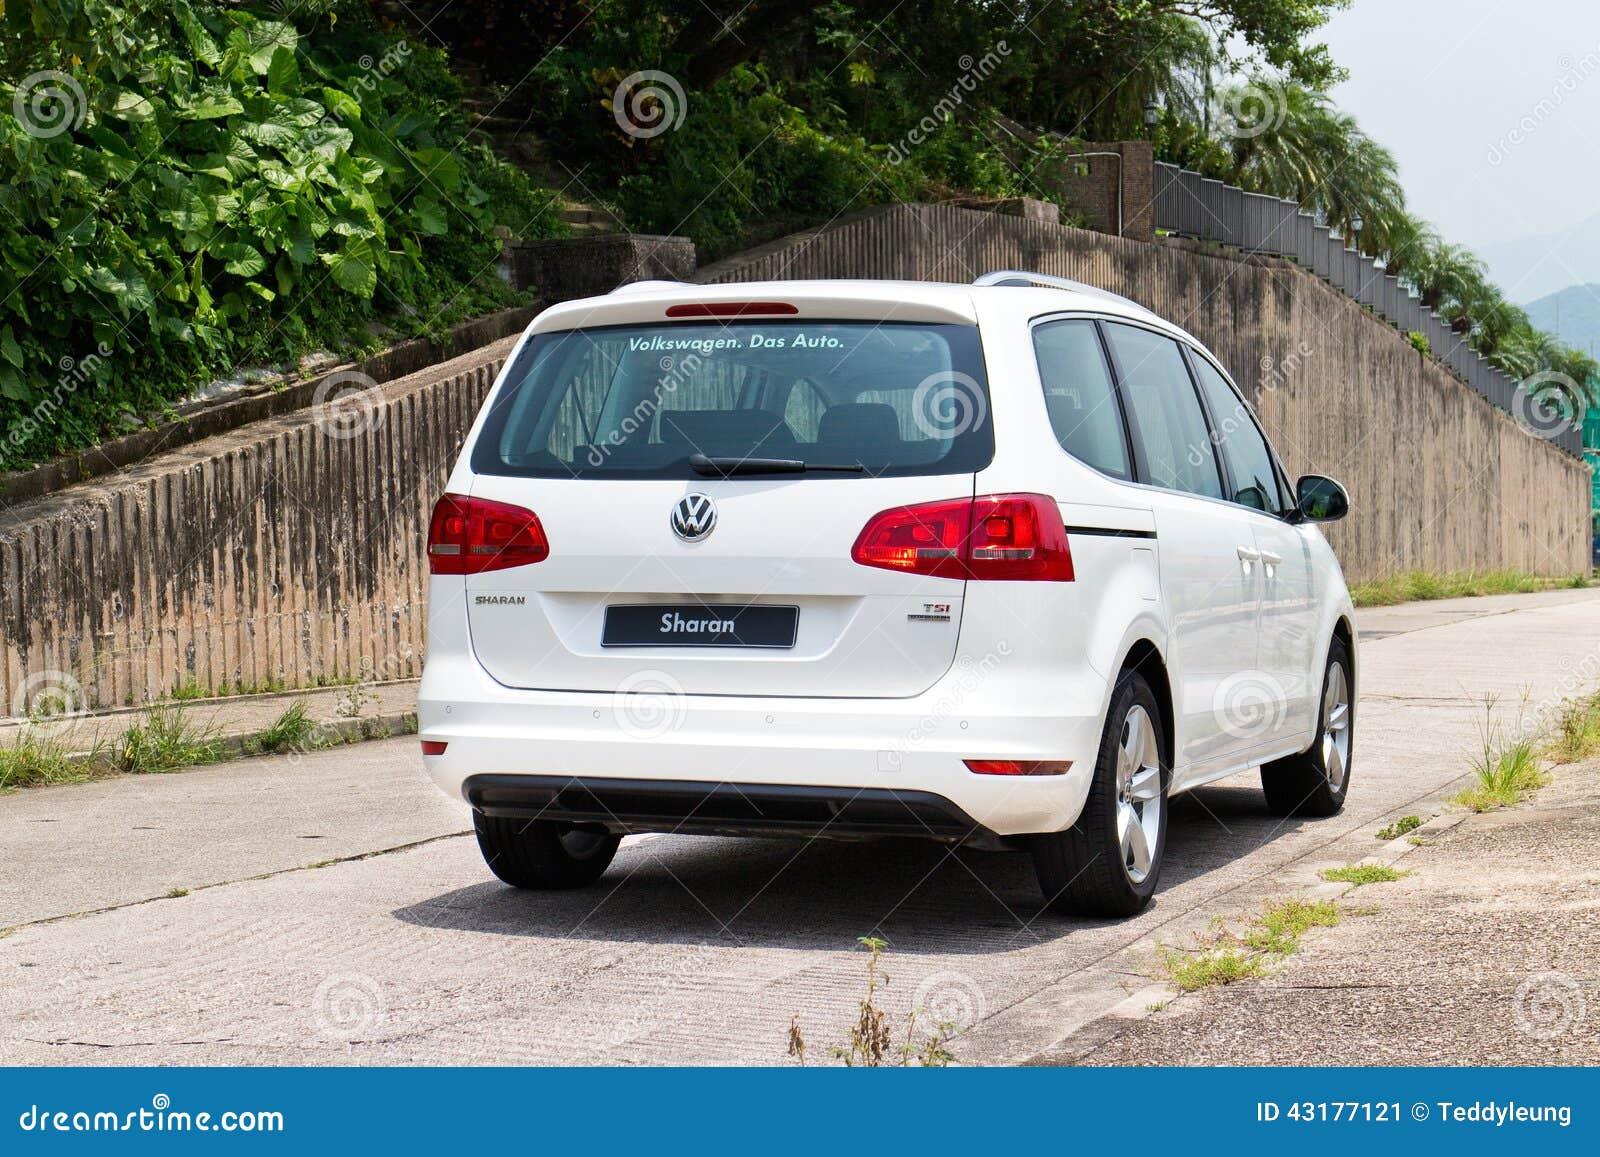 Volkswagen Sharan 2014 Editorial Photo - Image: 43177121